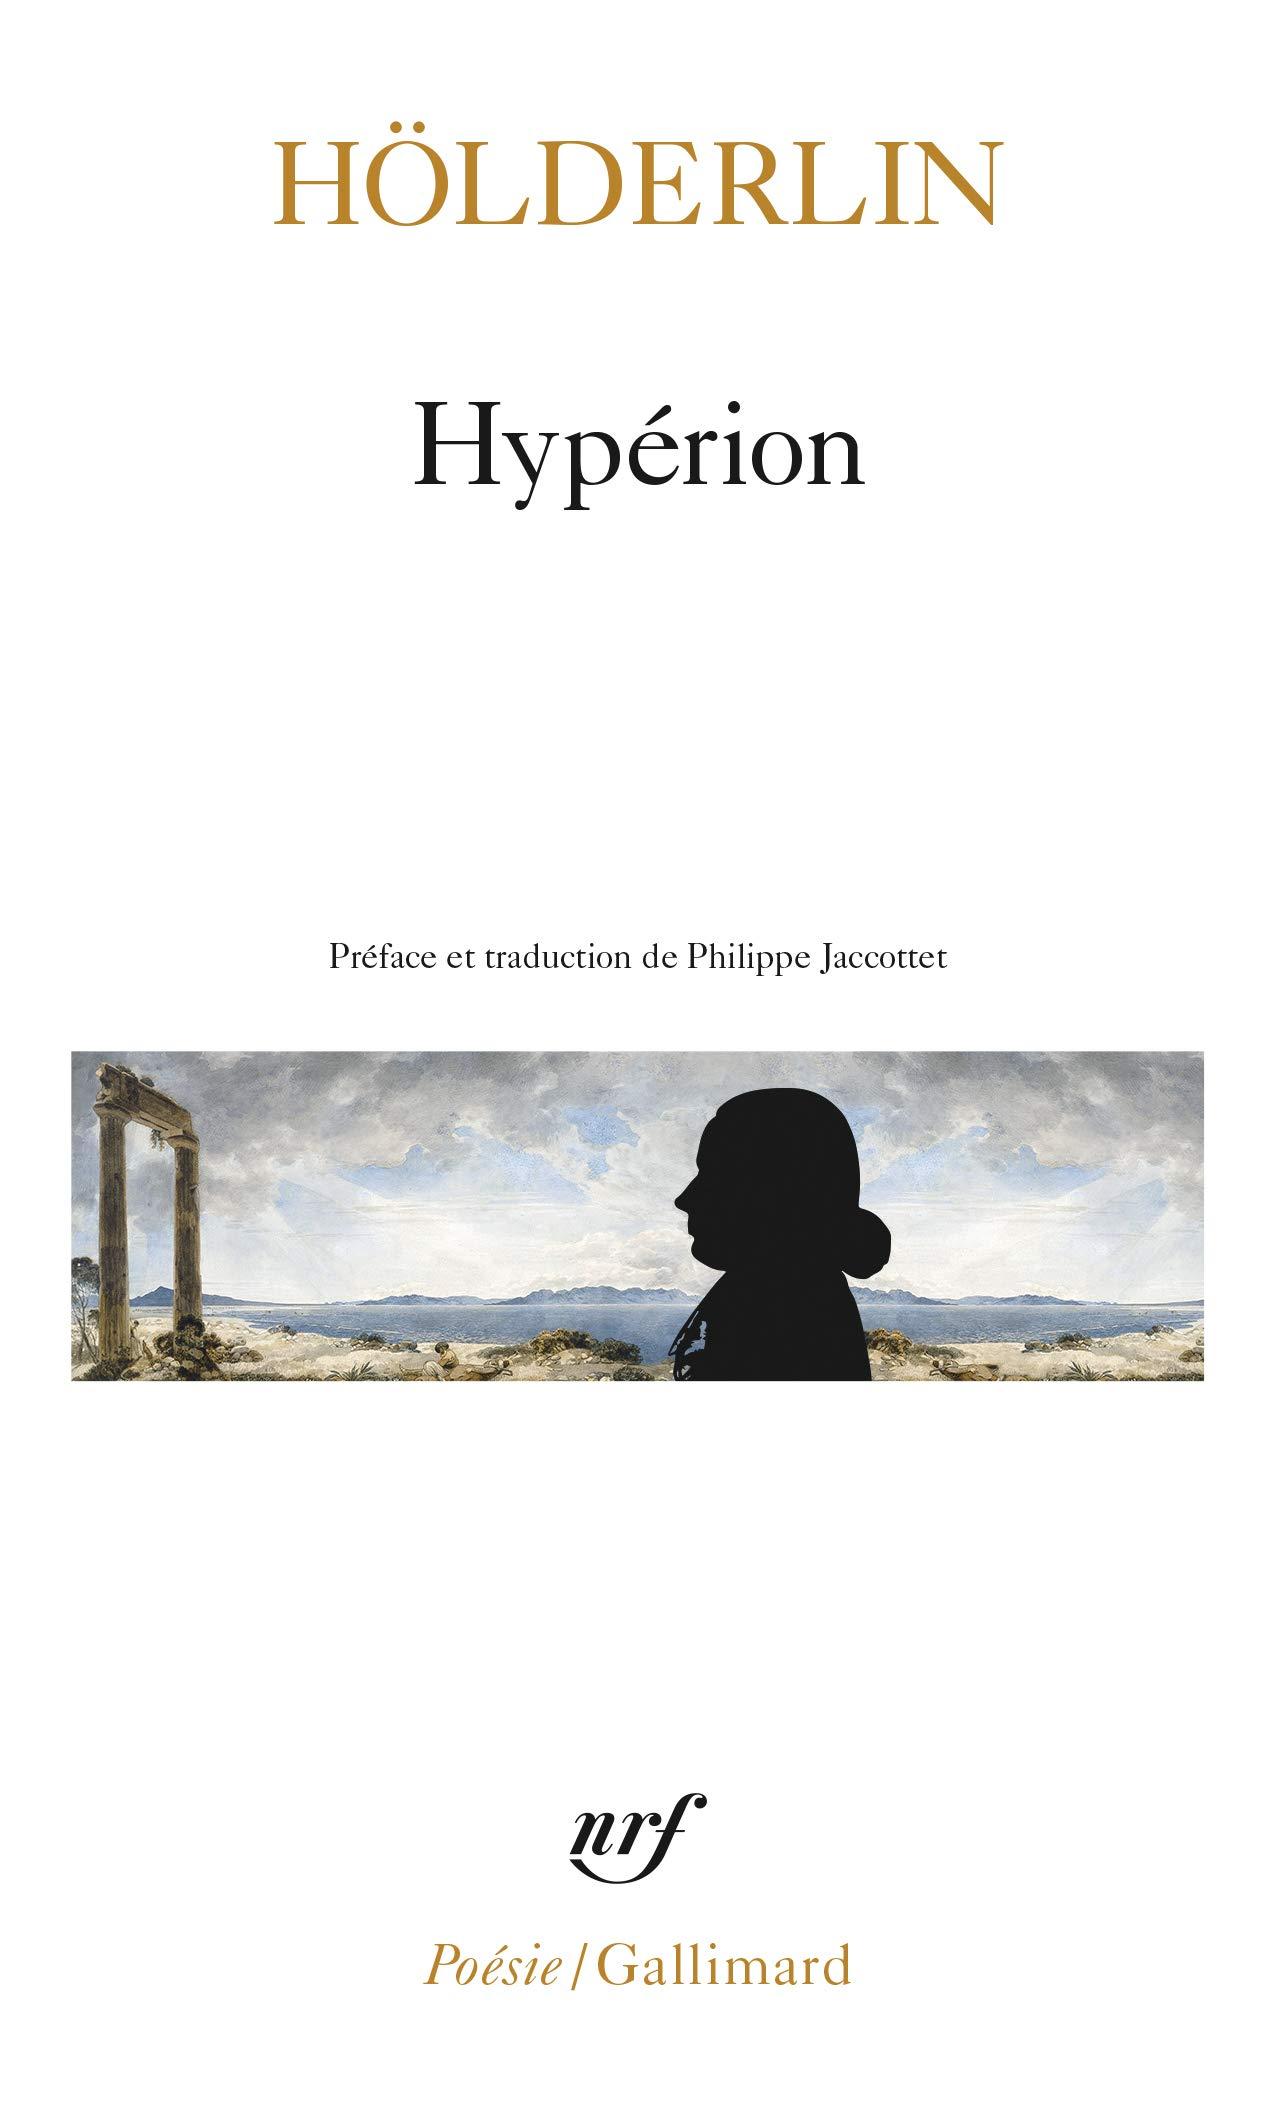 Hypérion - Hölderlin, Friedrich, Jaccottet, Philippe - Livres - Amazon.fr